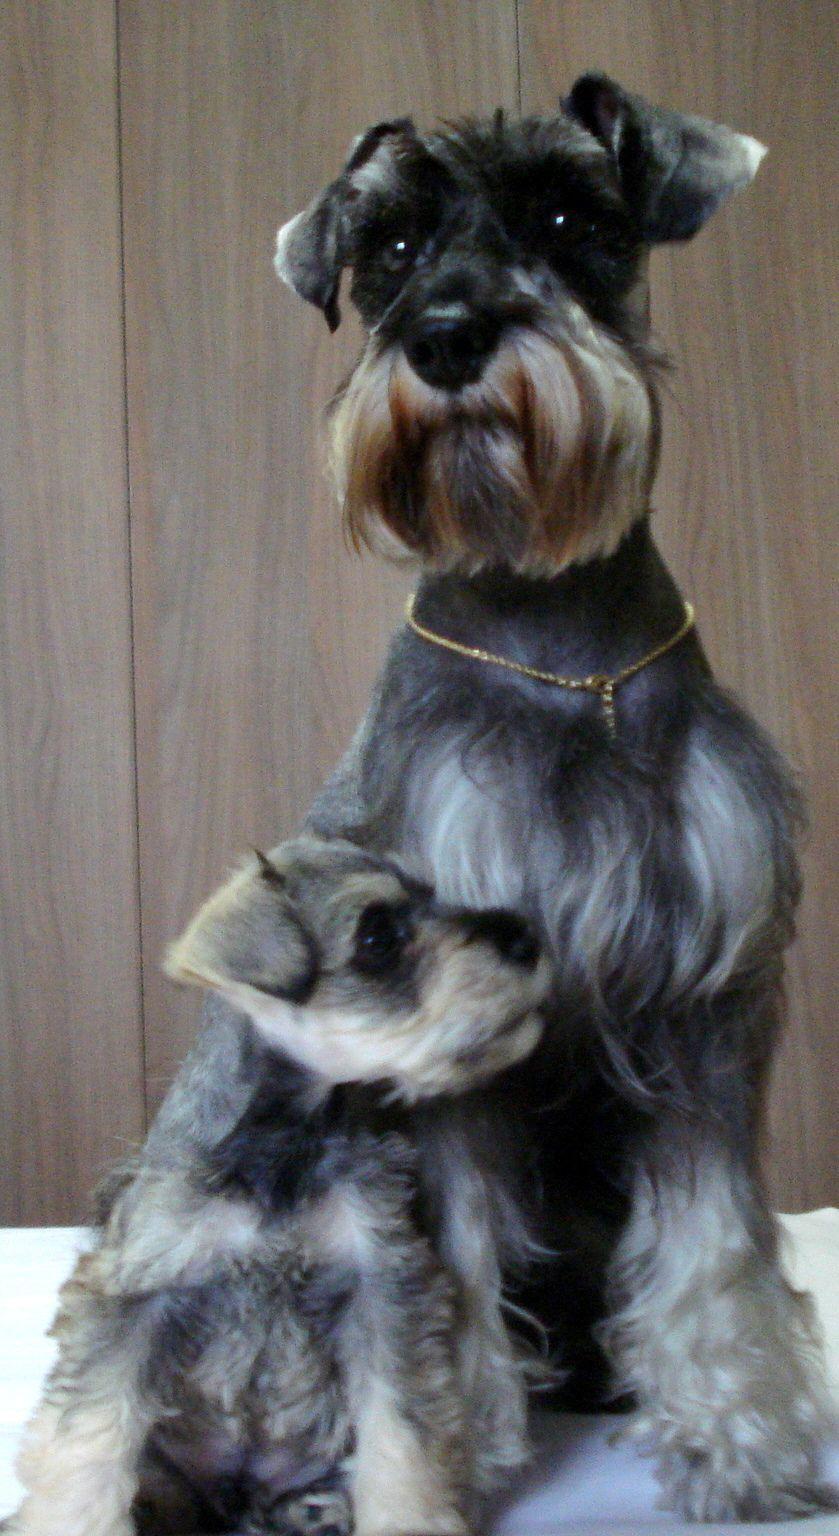 Buddy And Babybuddy Brazil Curtiba Perros Schnauzer Perros Snauzer Perros